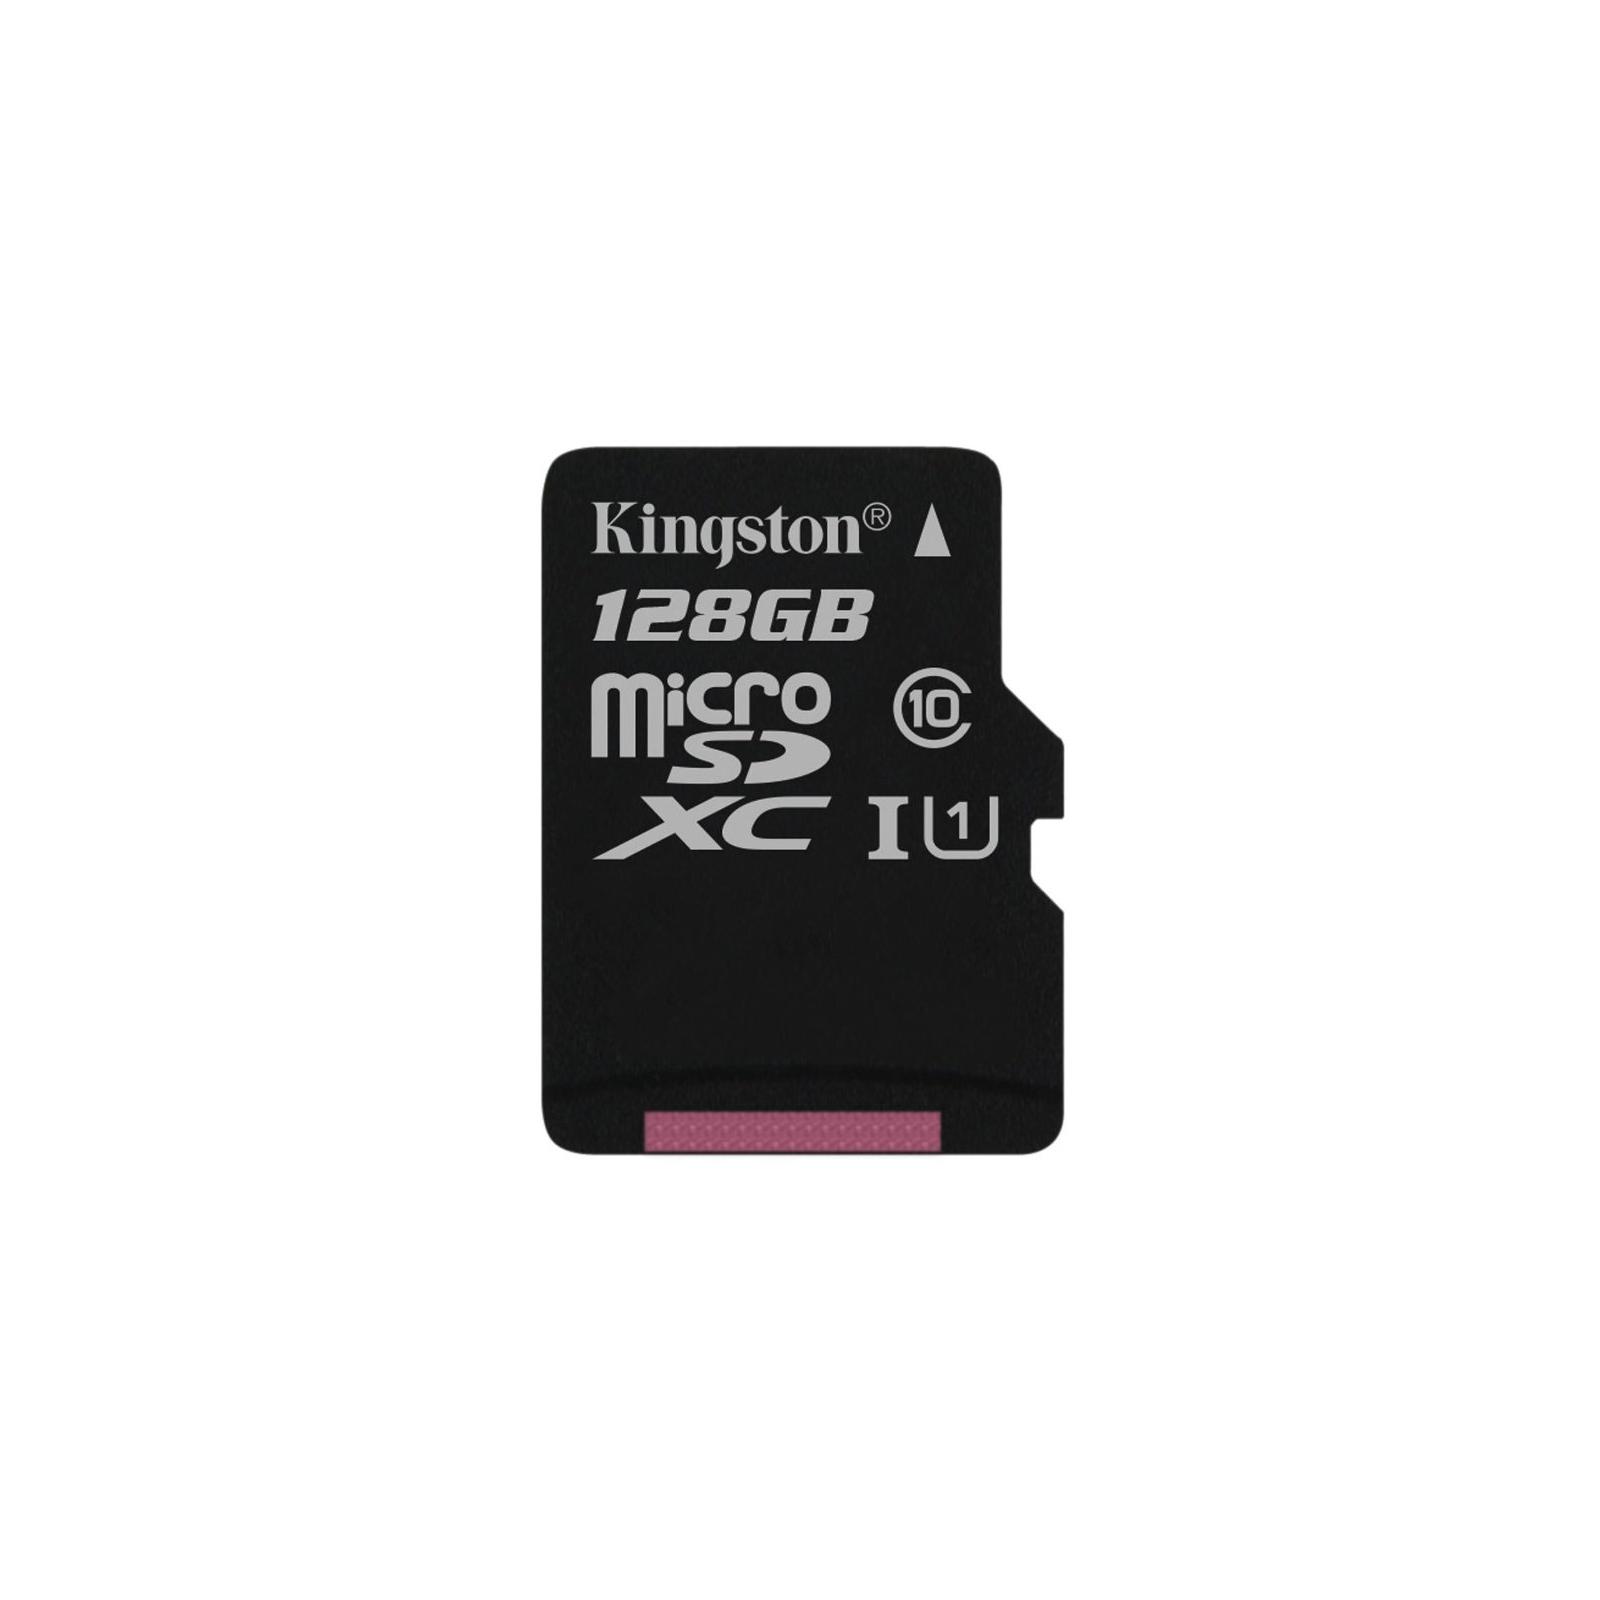 Карта памяти Kingston 128GB microSDXC Class 10 UHS| (SDC10G2/128GBSP)